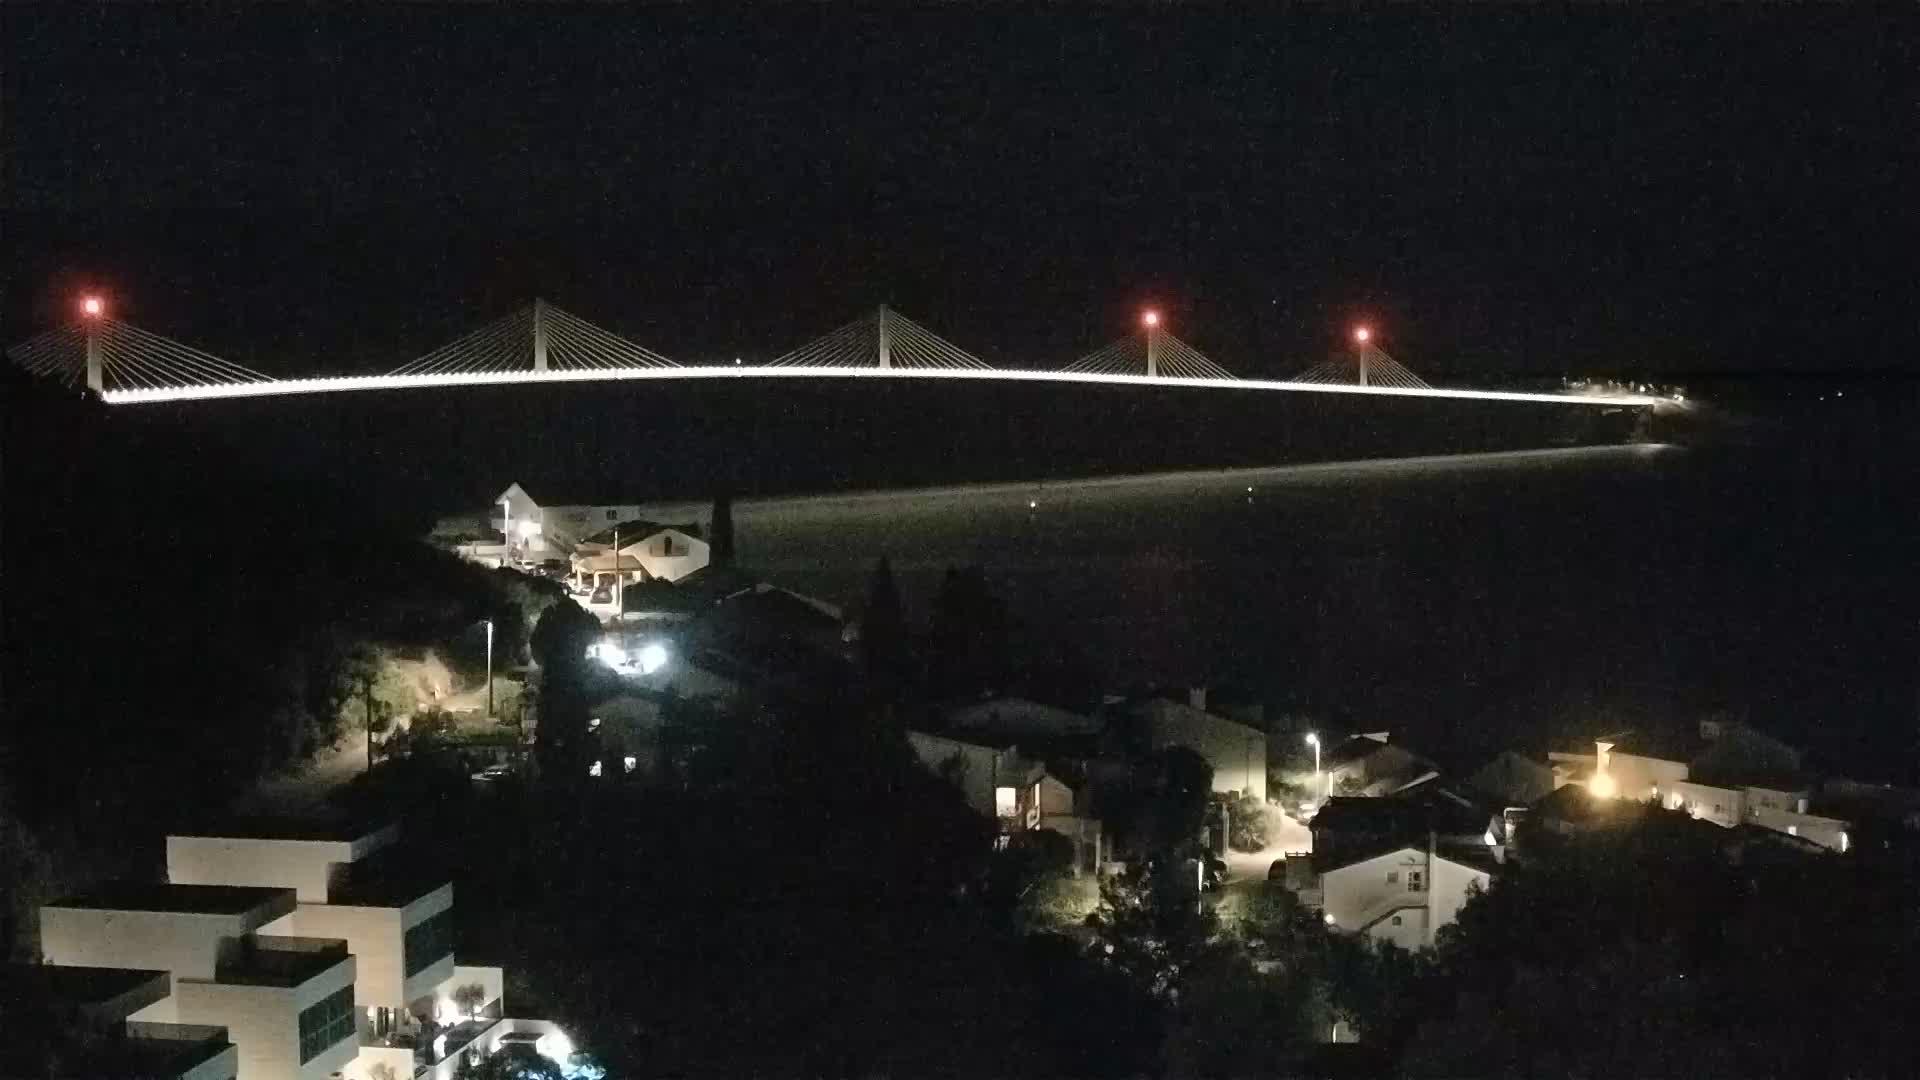 Webcam building Pelješac bridge